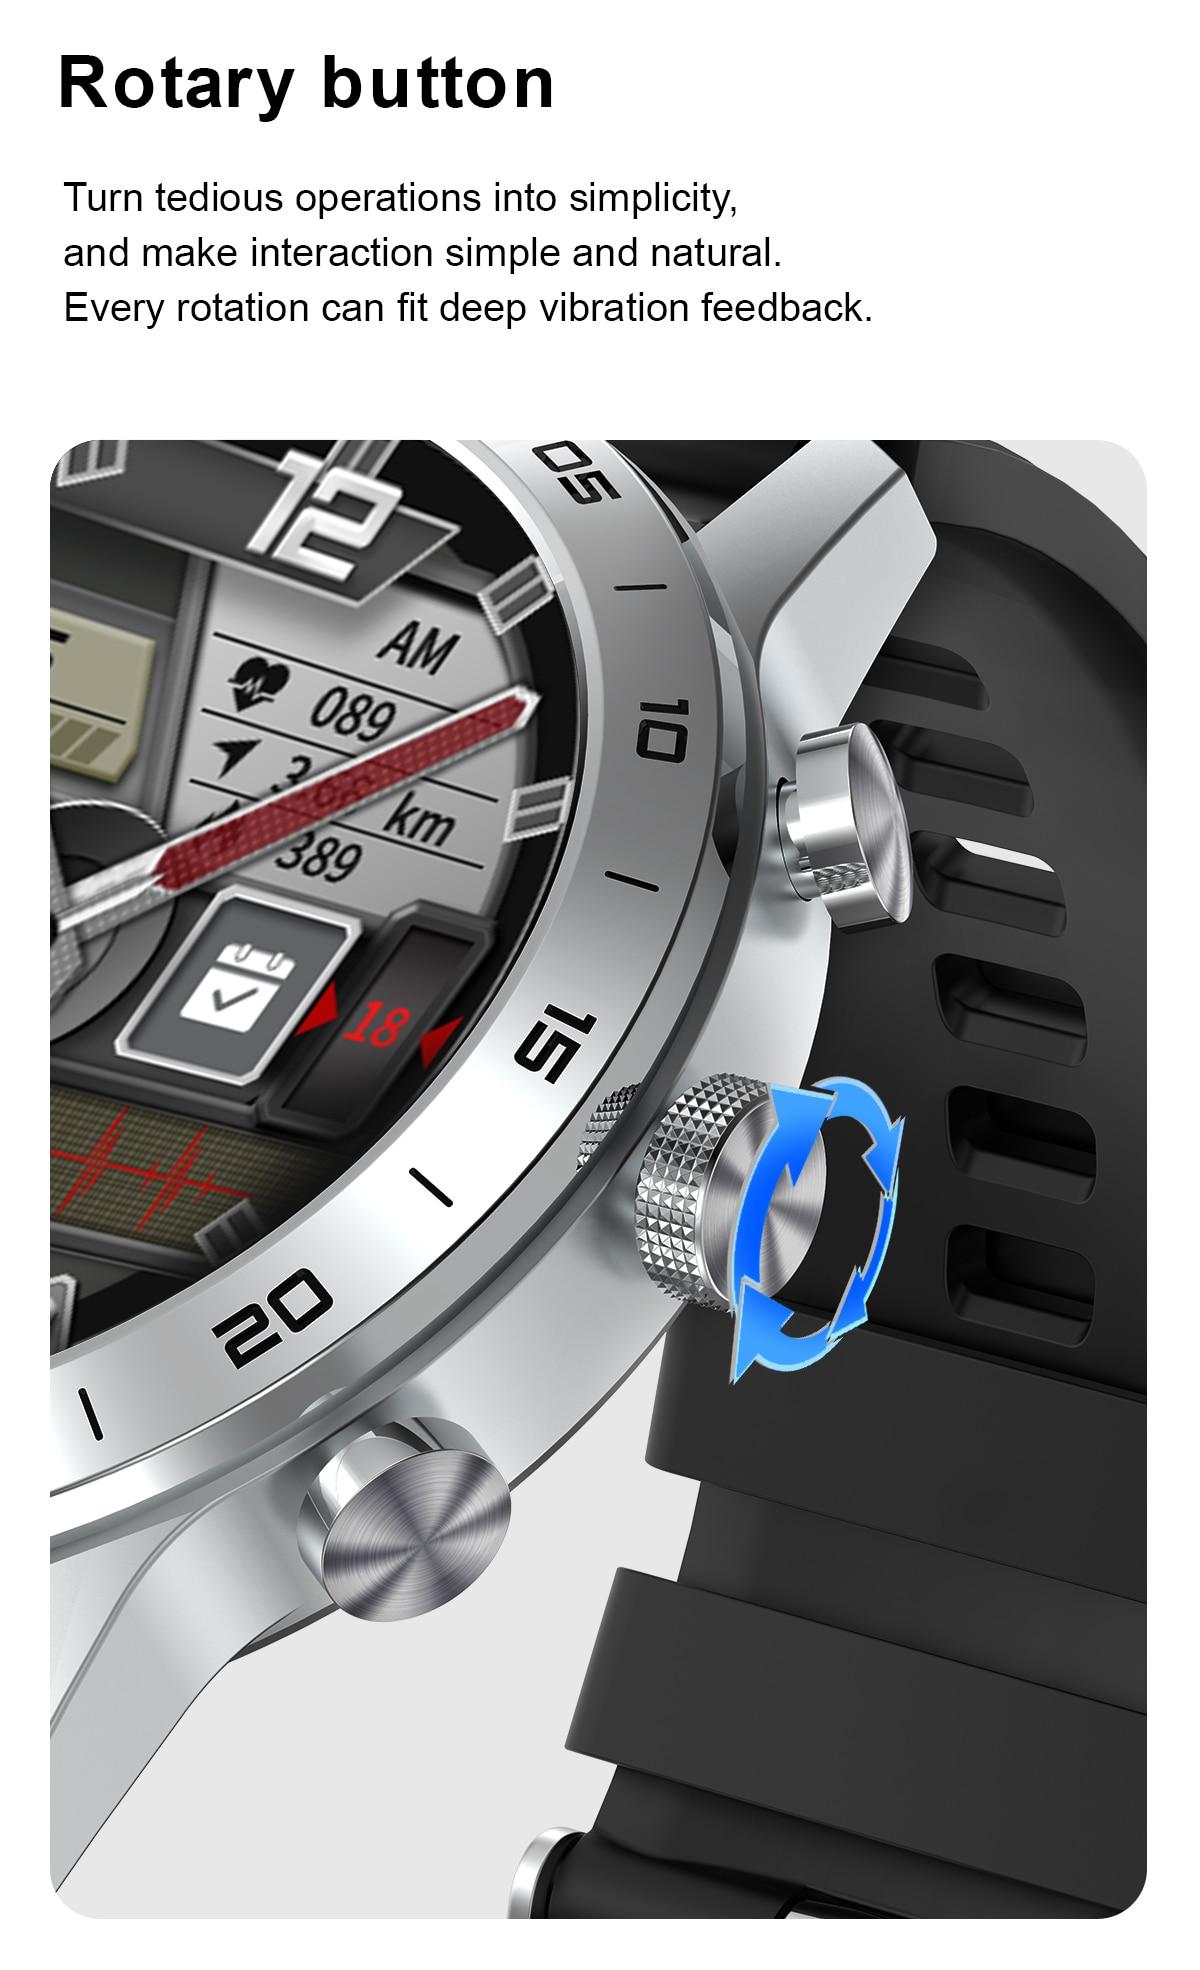 SANLEPUS Wireless Charging Smart Watch 2021 NEW IP68 Waterproof Smartwatch Men's Watches Fitness Bracelet For Apple Android